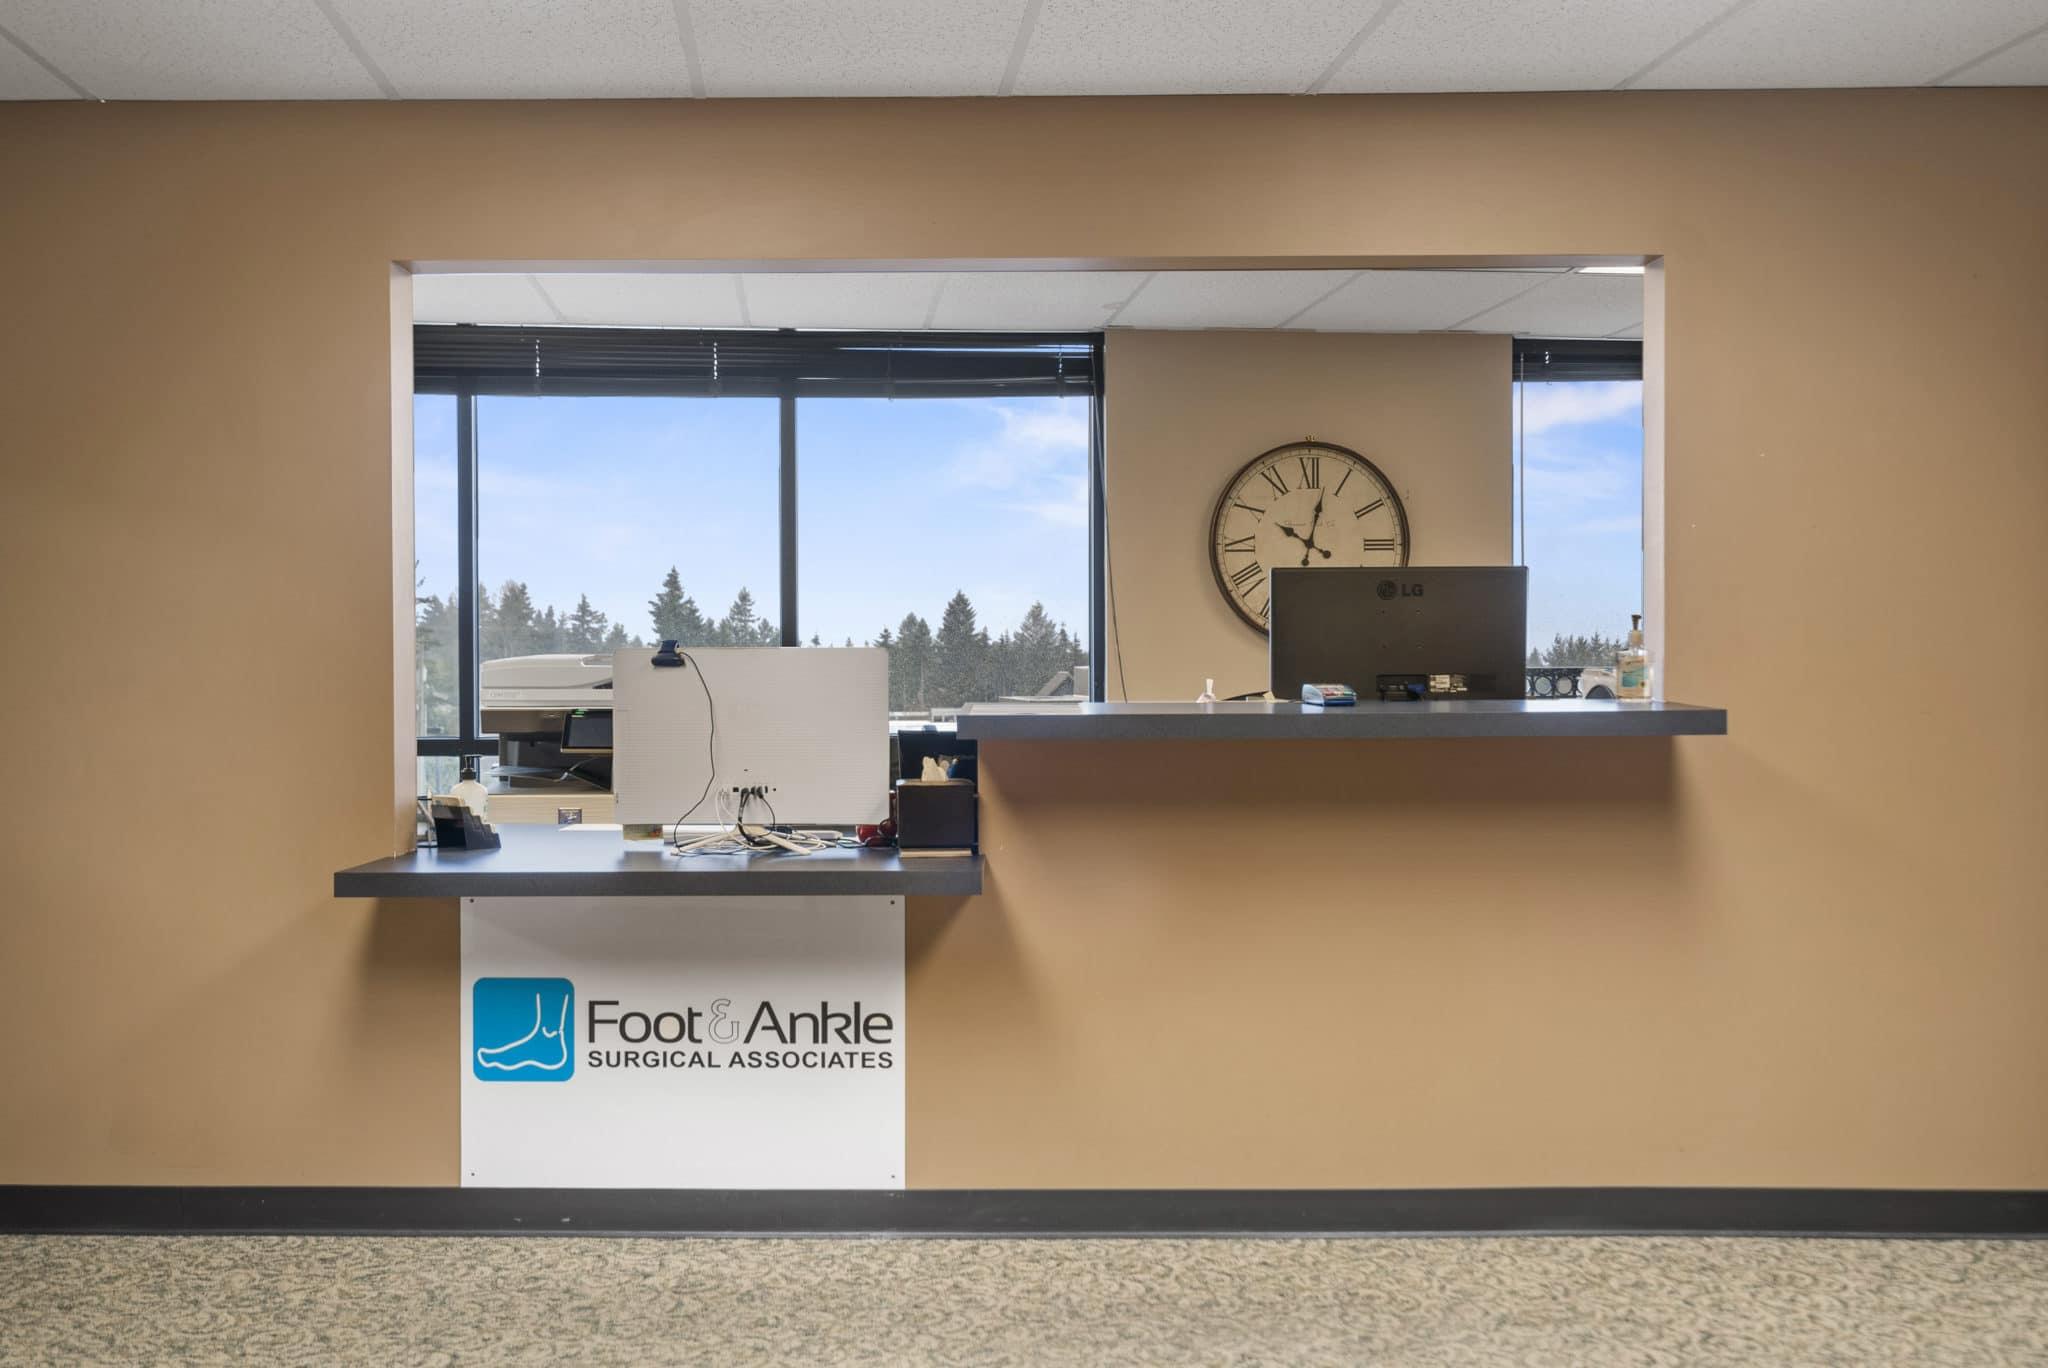 FASA Tacoma clinic located in University Place, WA